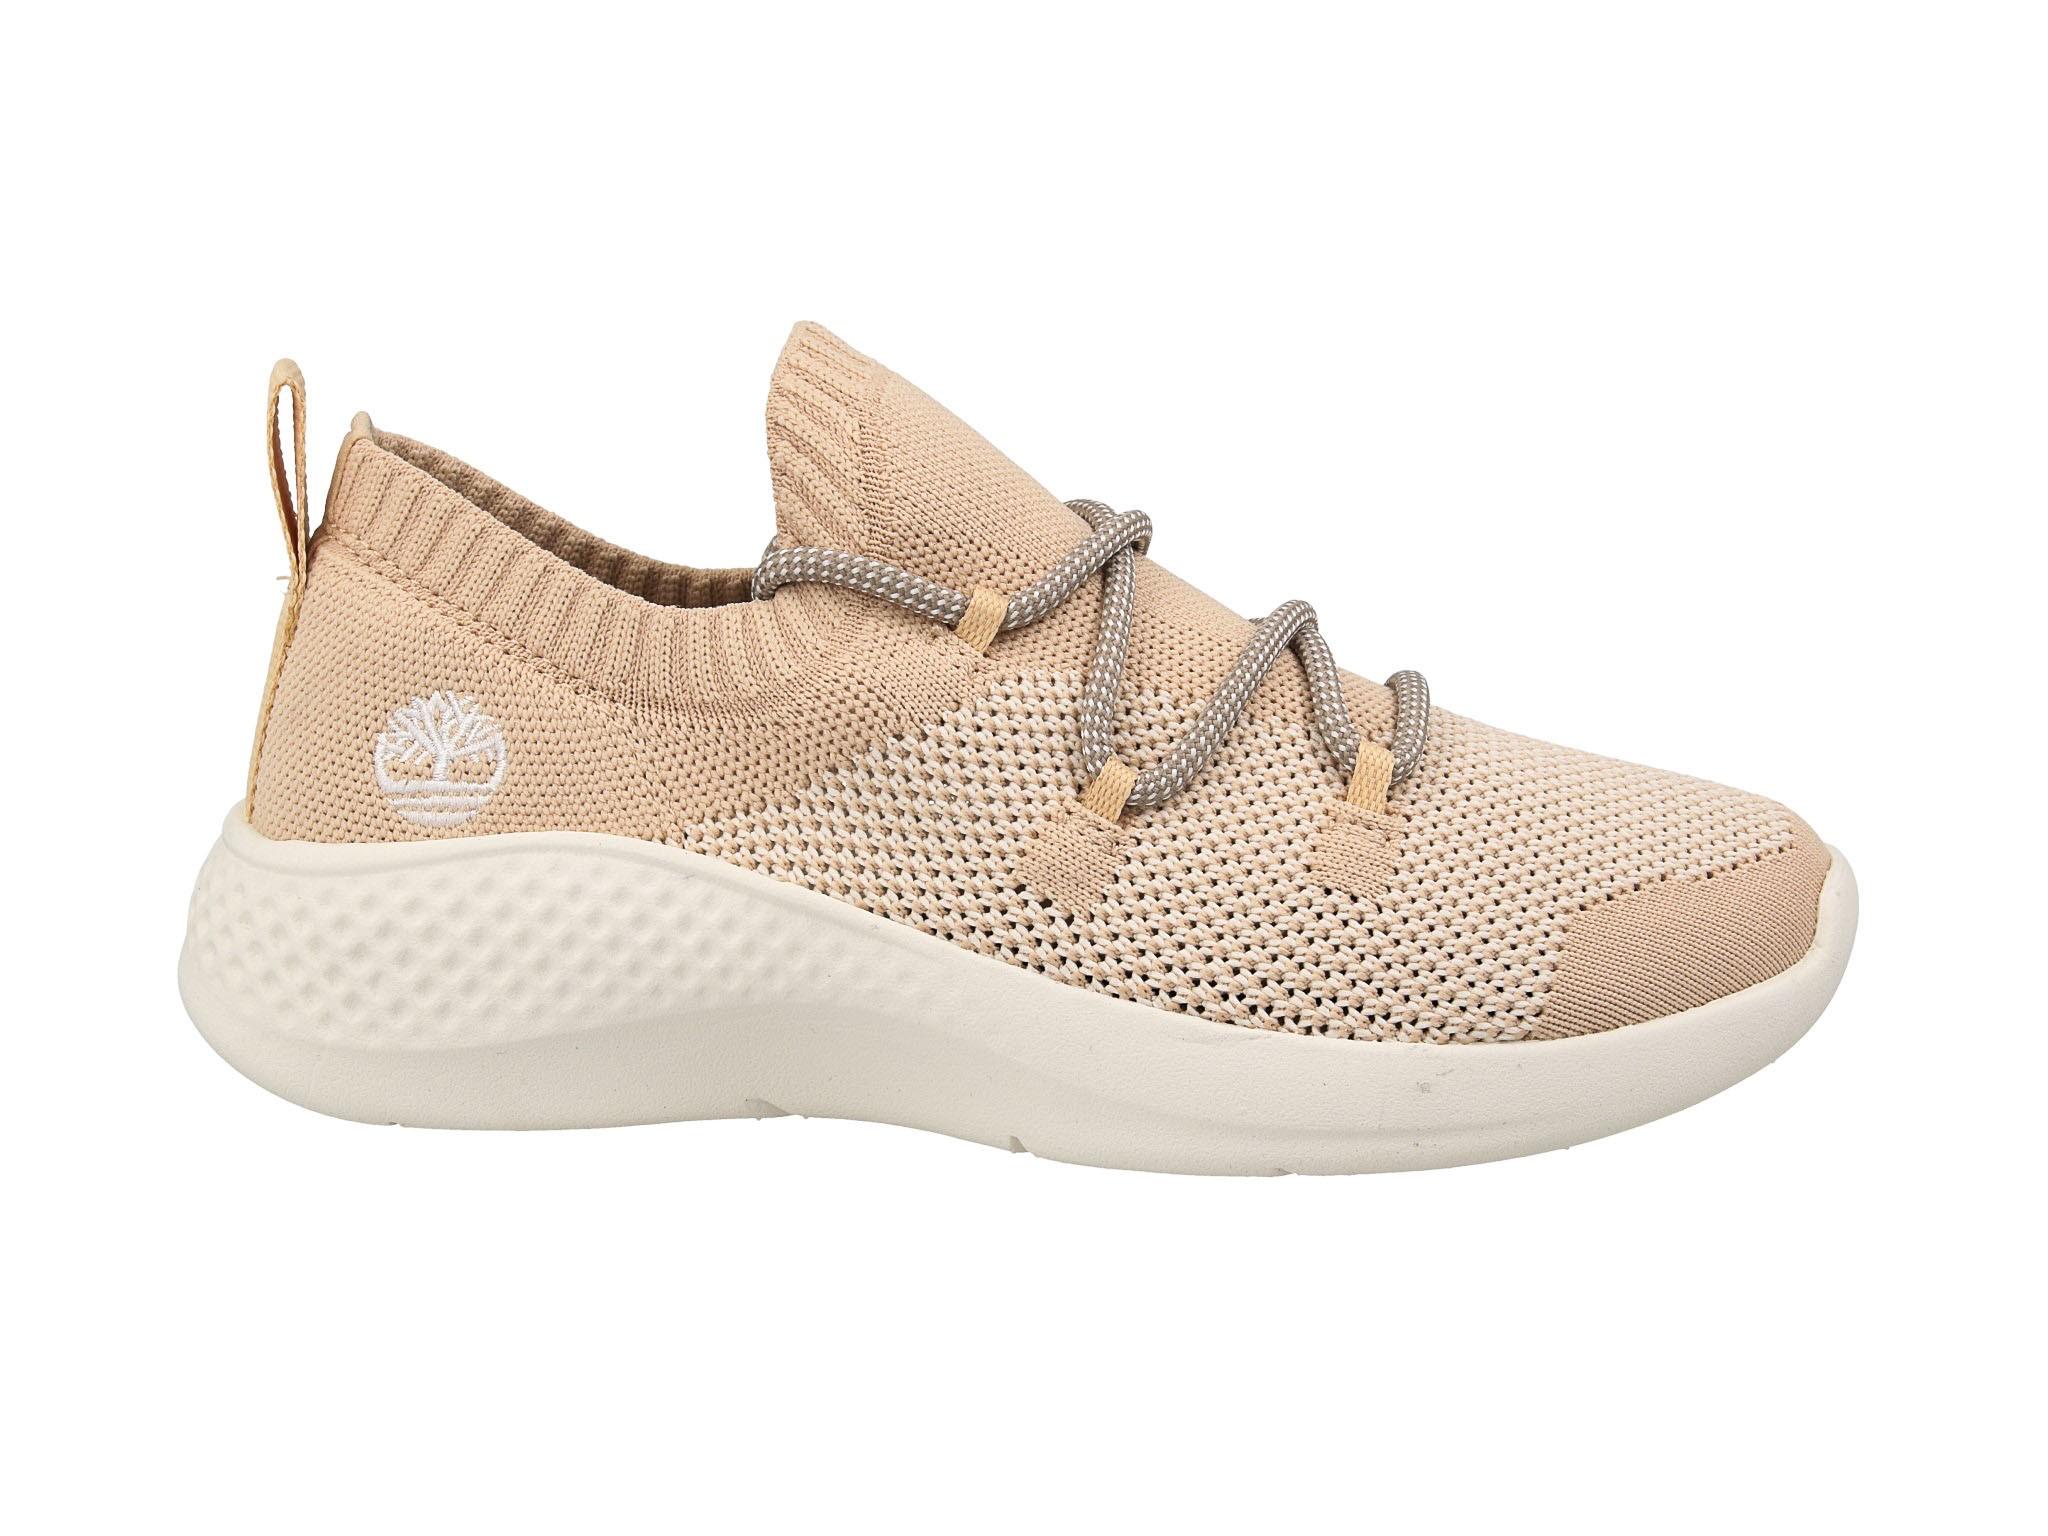 Sneakers TIMBERLAND FlyRoam Go Stohl Oxford TB0A24V5K39 Light Beige Knit